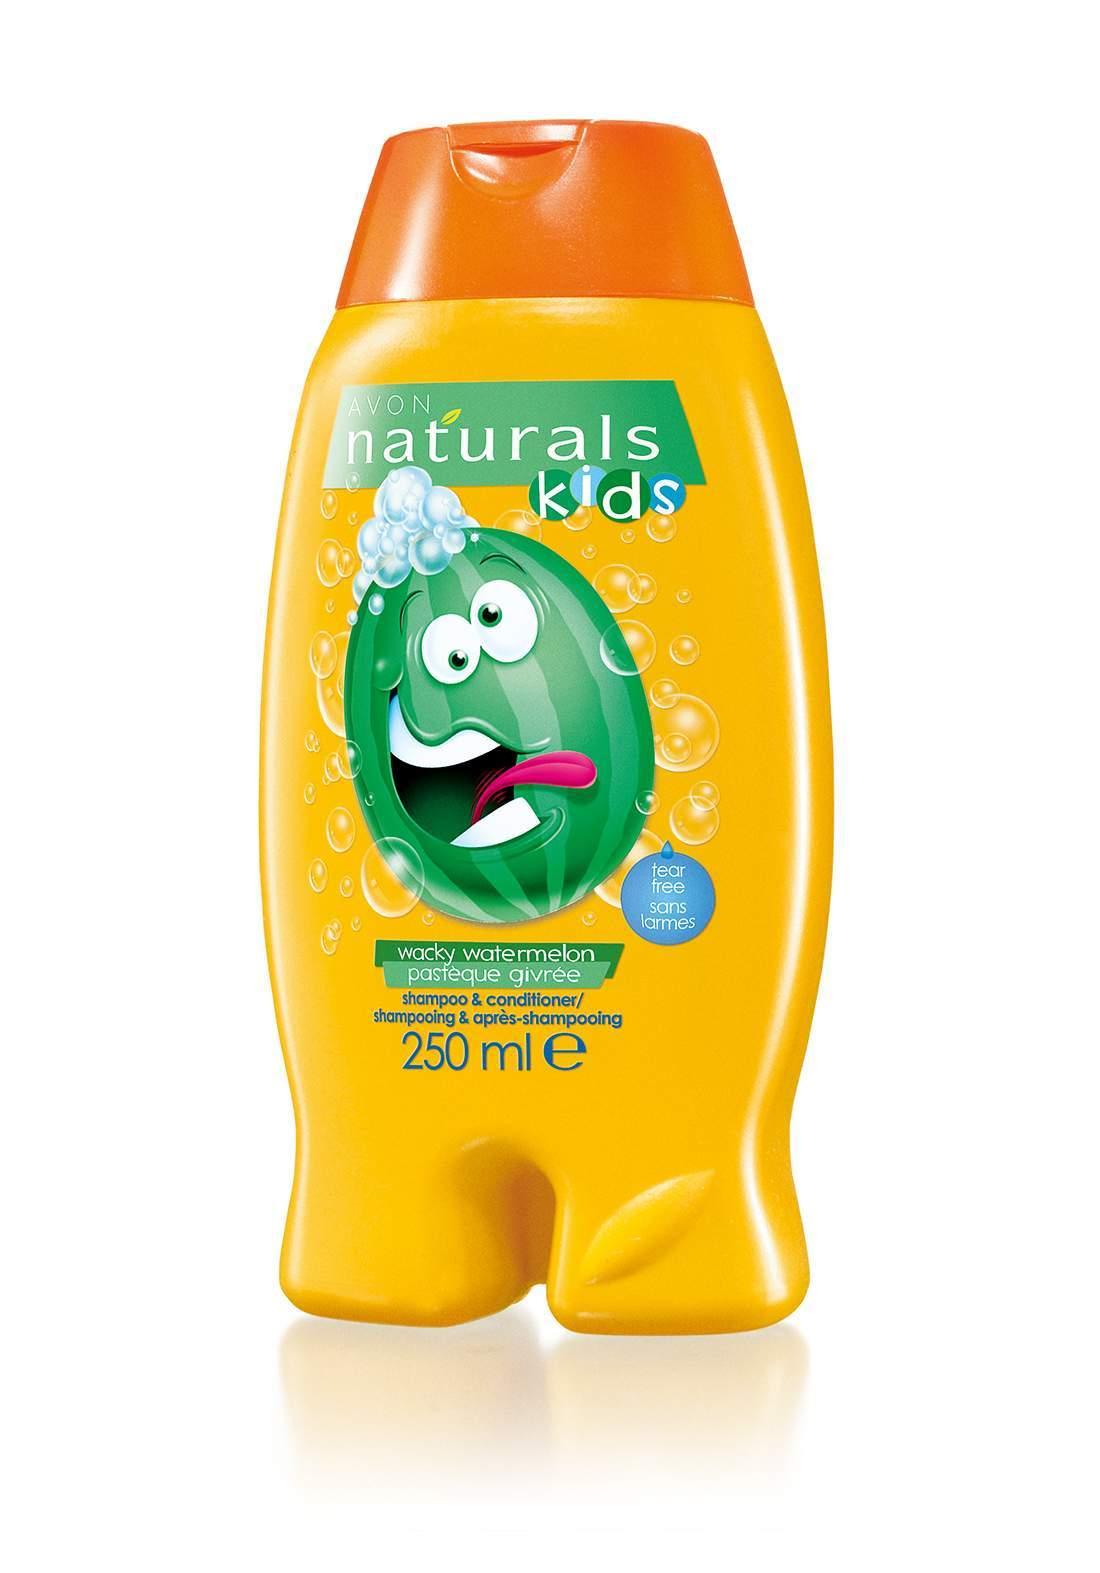 (1819100)Avon Naturals 2-in-1 Baby Shampoo and Conditioner 250ml  شامبو وبلسم 2 في 1 للأطفال